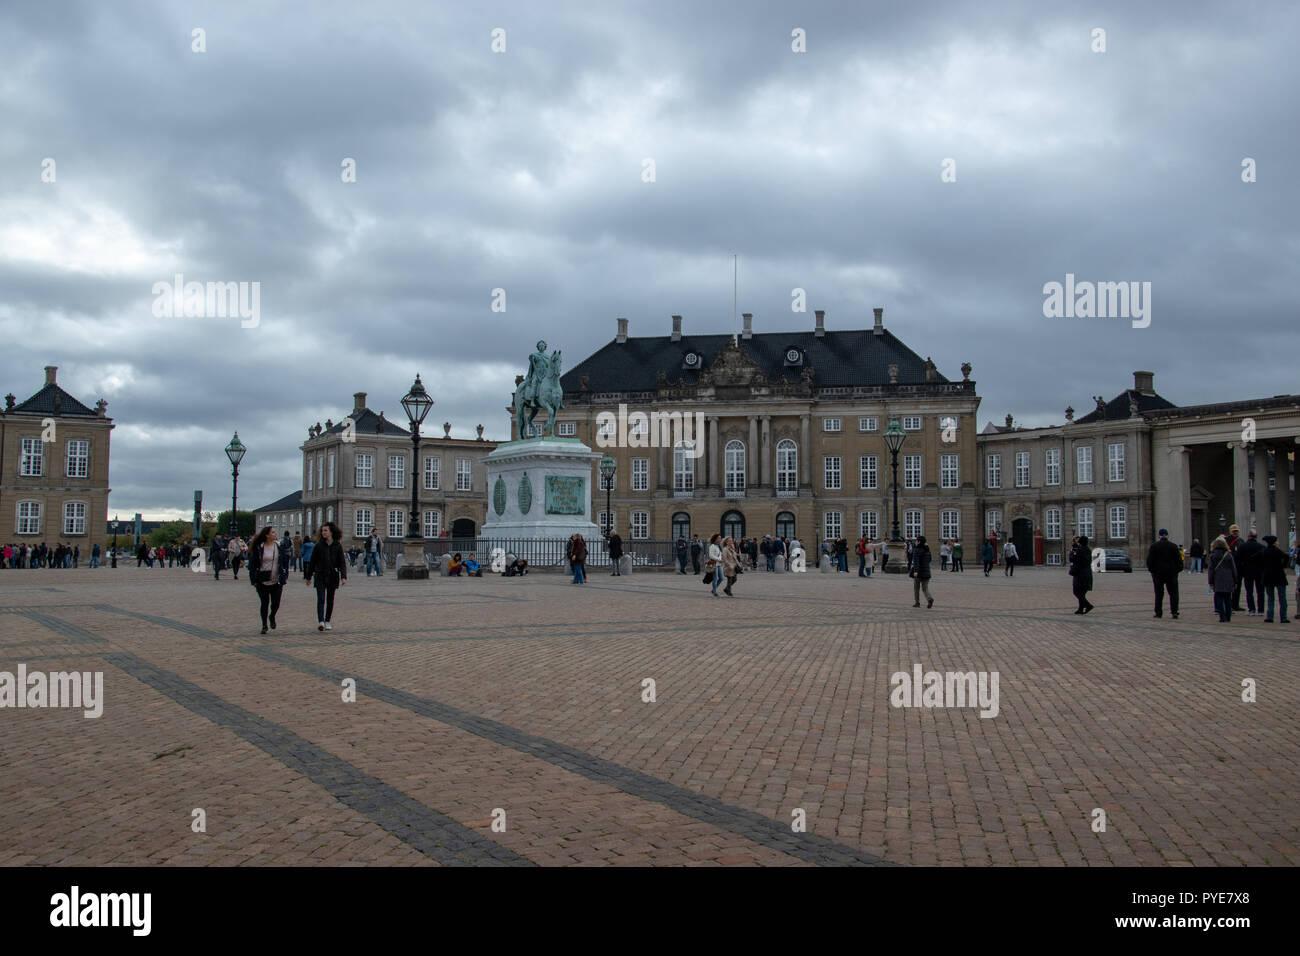 Levetzau Palace (Christian VIII, Christian X) part of Amalienborg Palace, Royal Palace since 1794. Copenhagen, Denmark - Stock Image